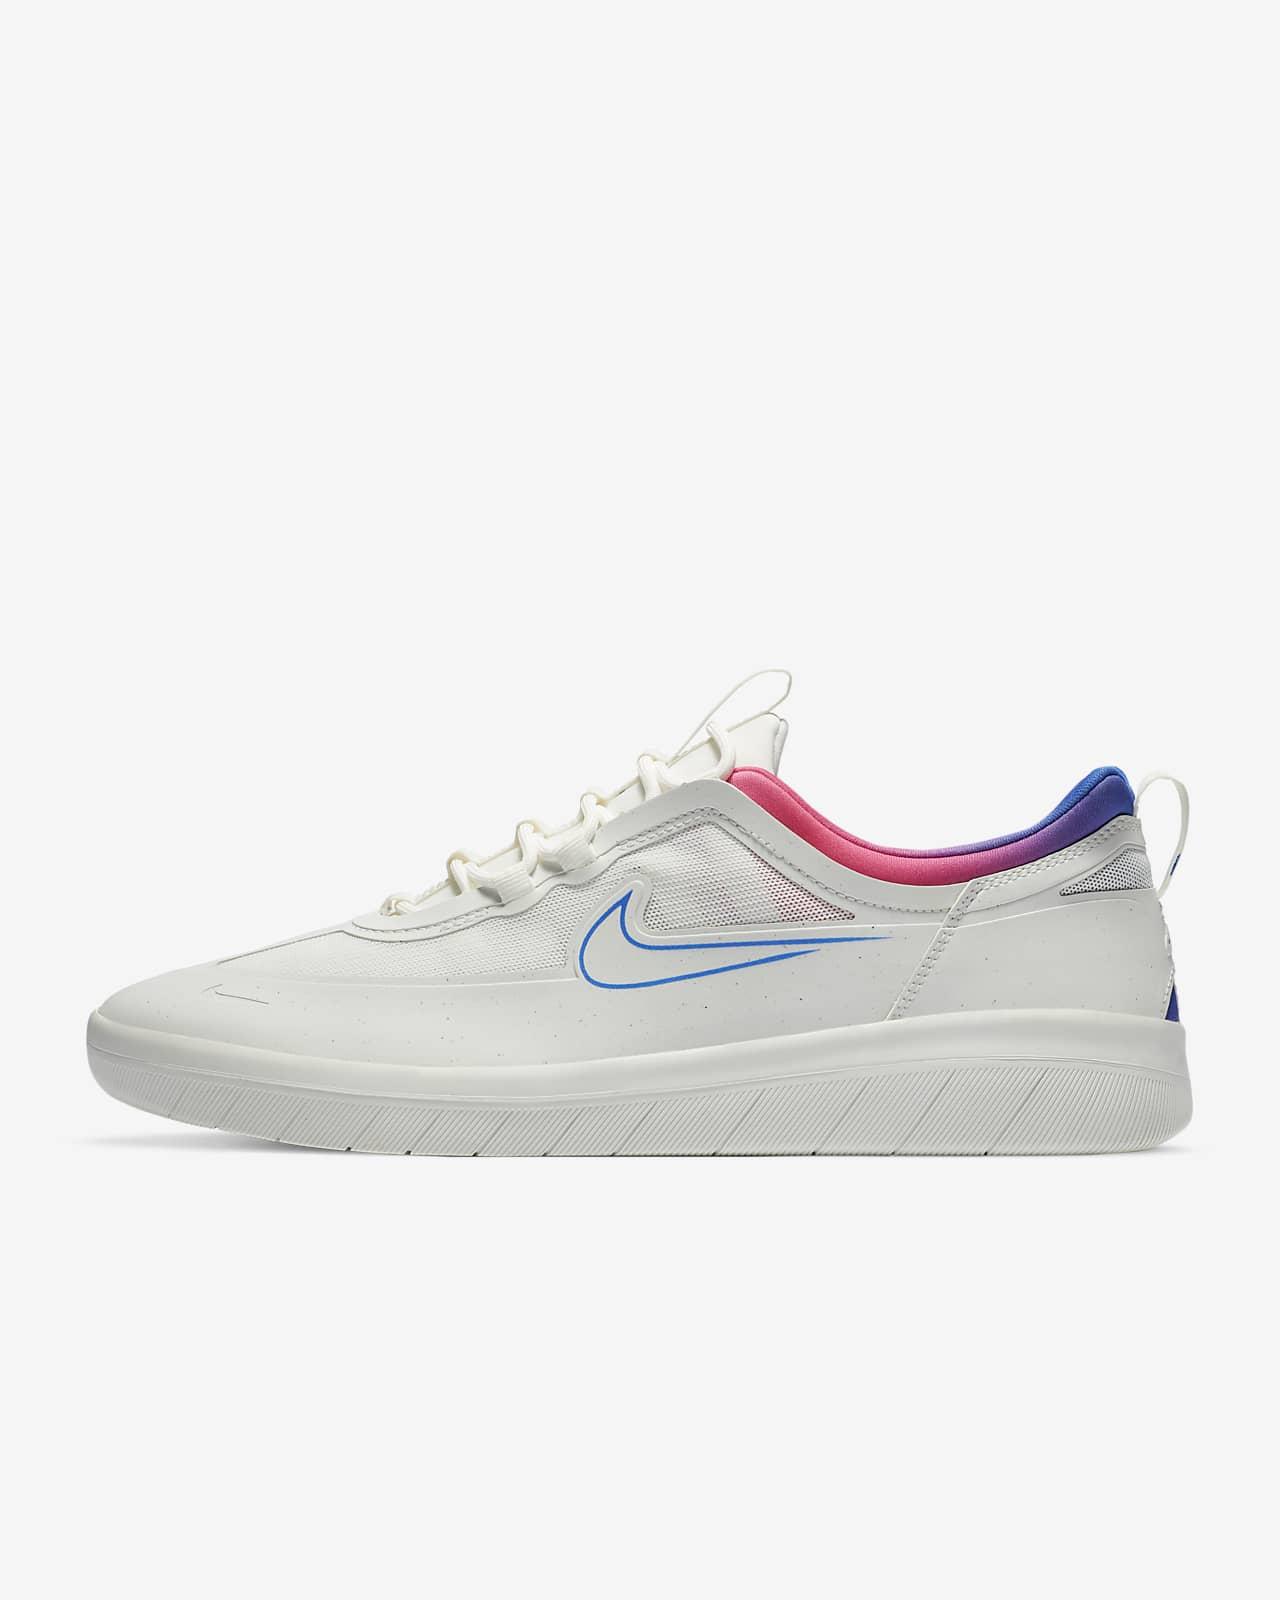 Ruidoso Desprecio Puede soportar  Nike SB Nyjah Free 2 Skate Shoe. Nike ID